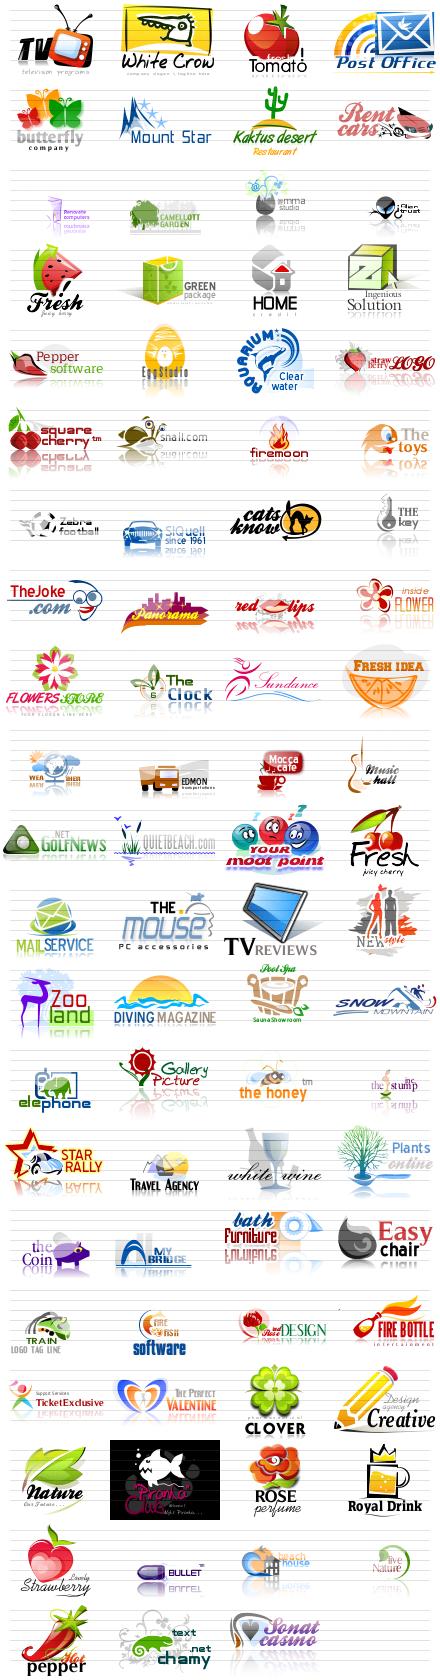 mediaexpress-logo-service-classflair